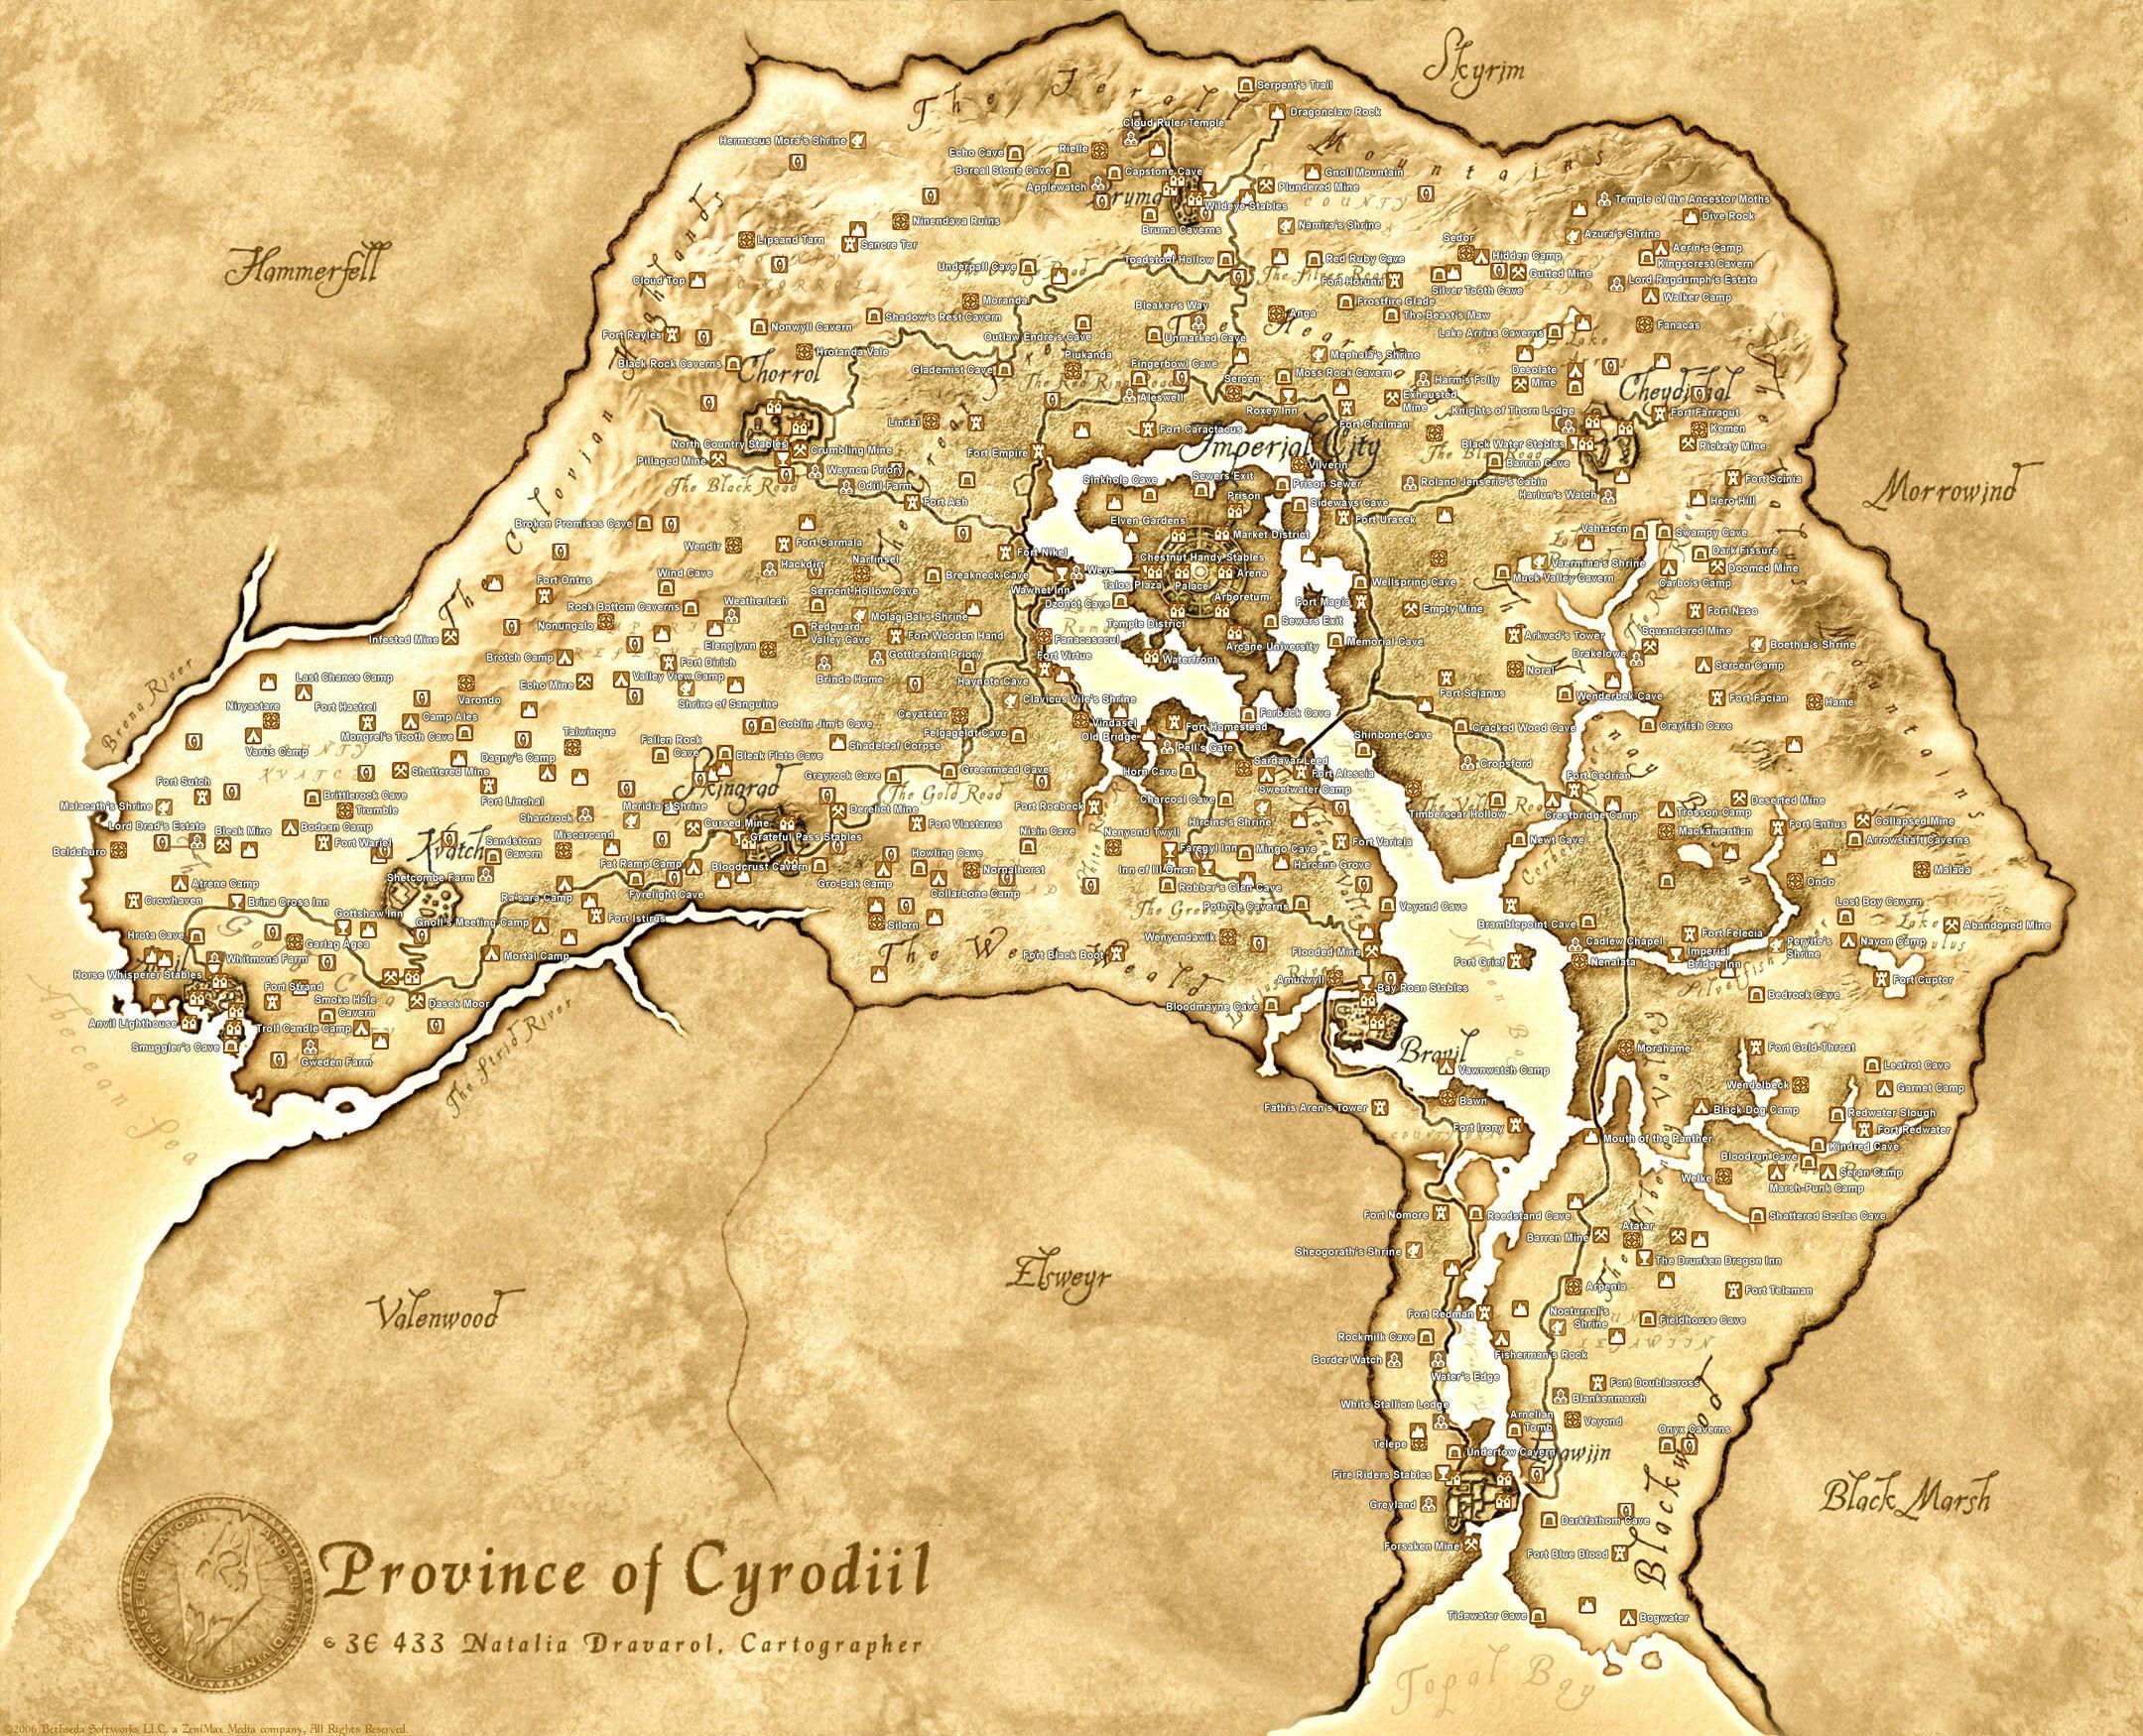 Scroll down to read : skyrim hearthfire map by chinua achebe